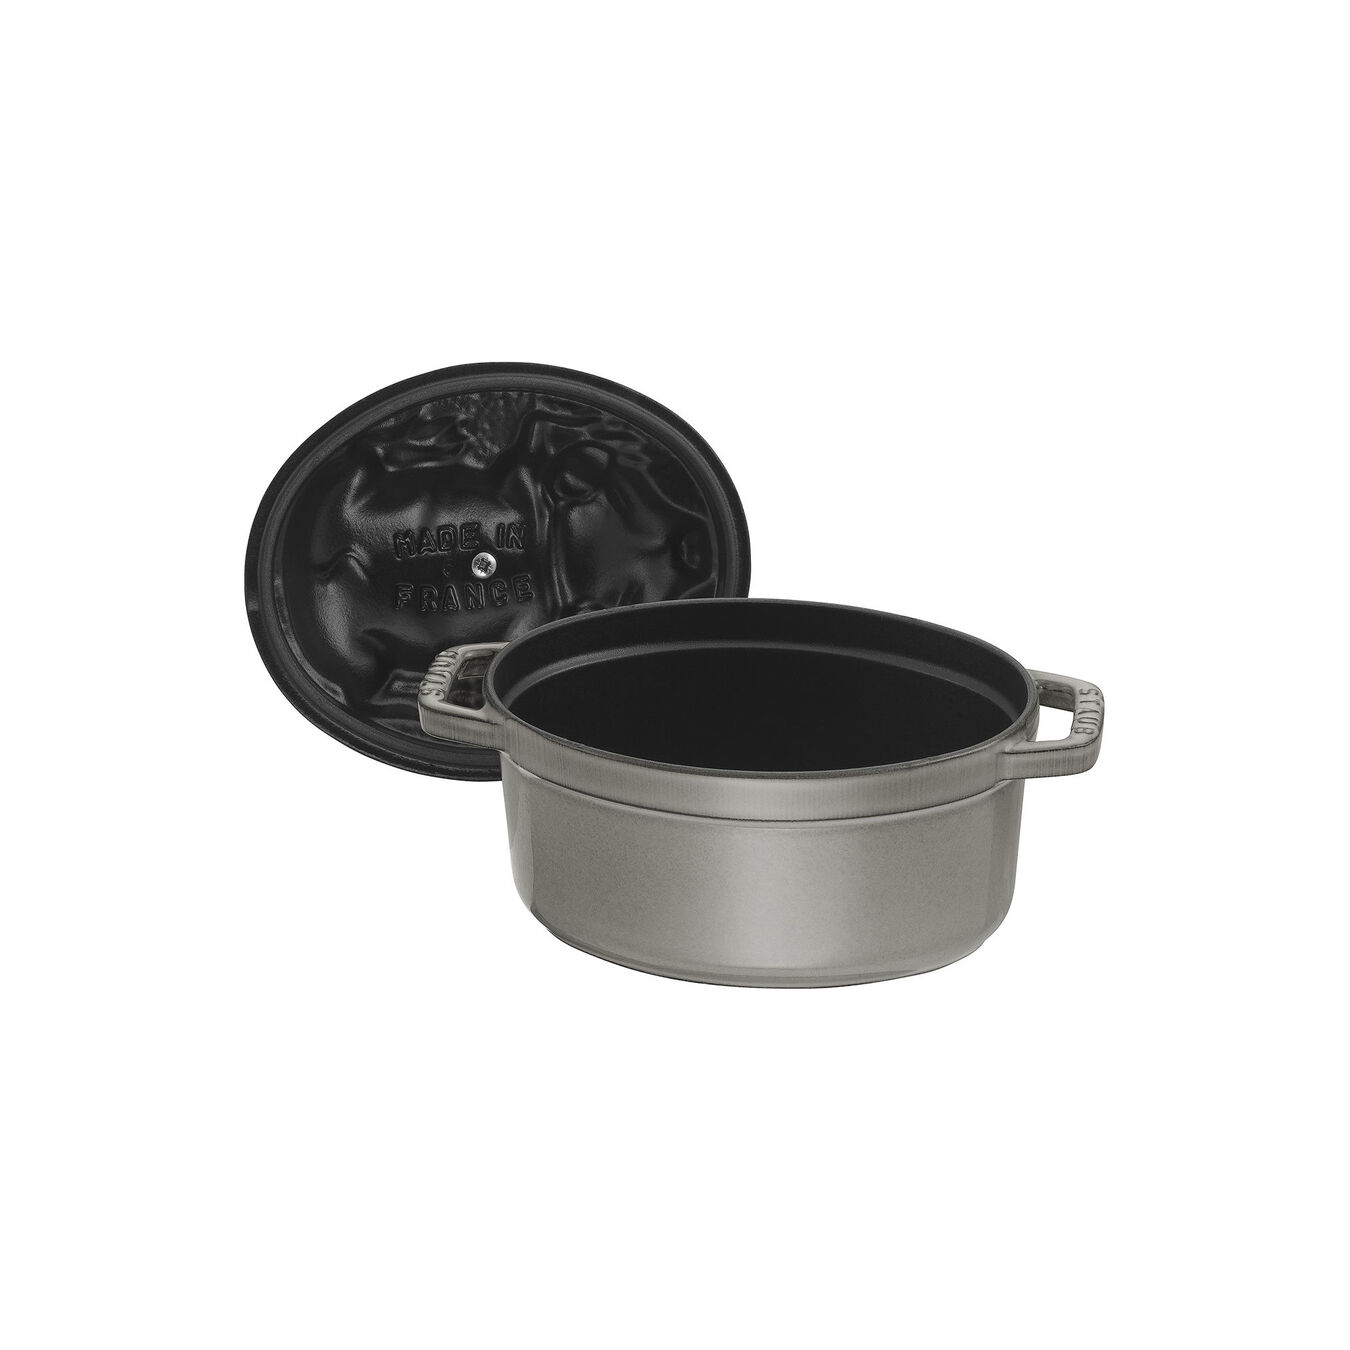 Caçarola 17 cm, oval, Cinza grafite, Ferro fundido,,large 6